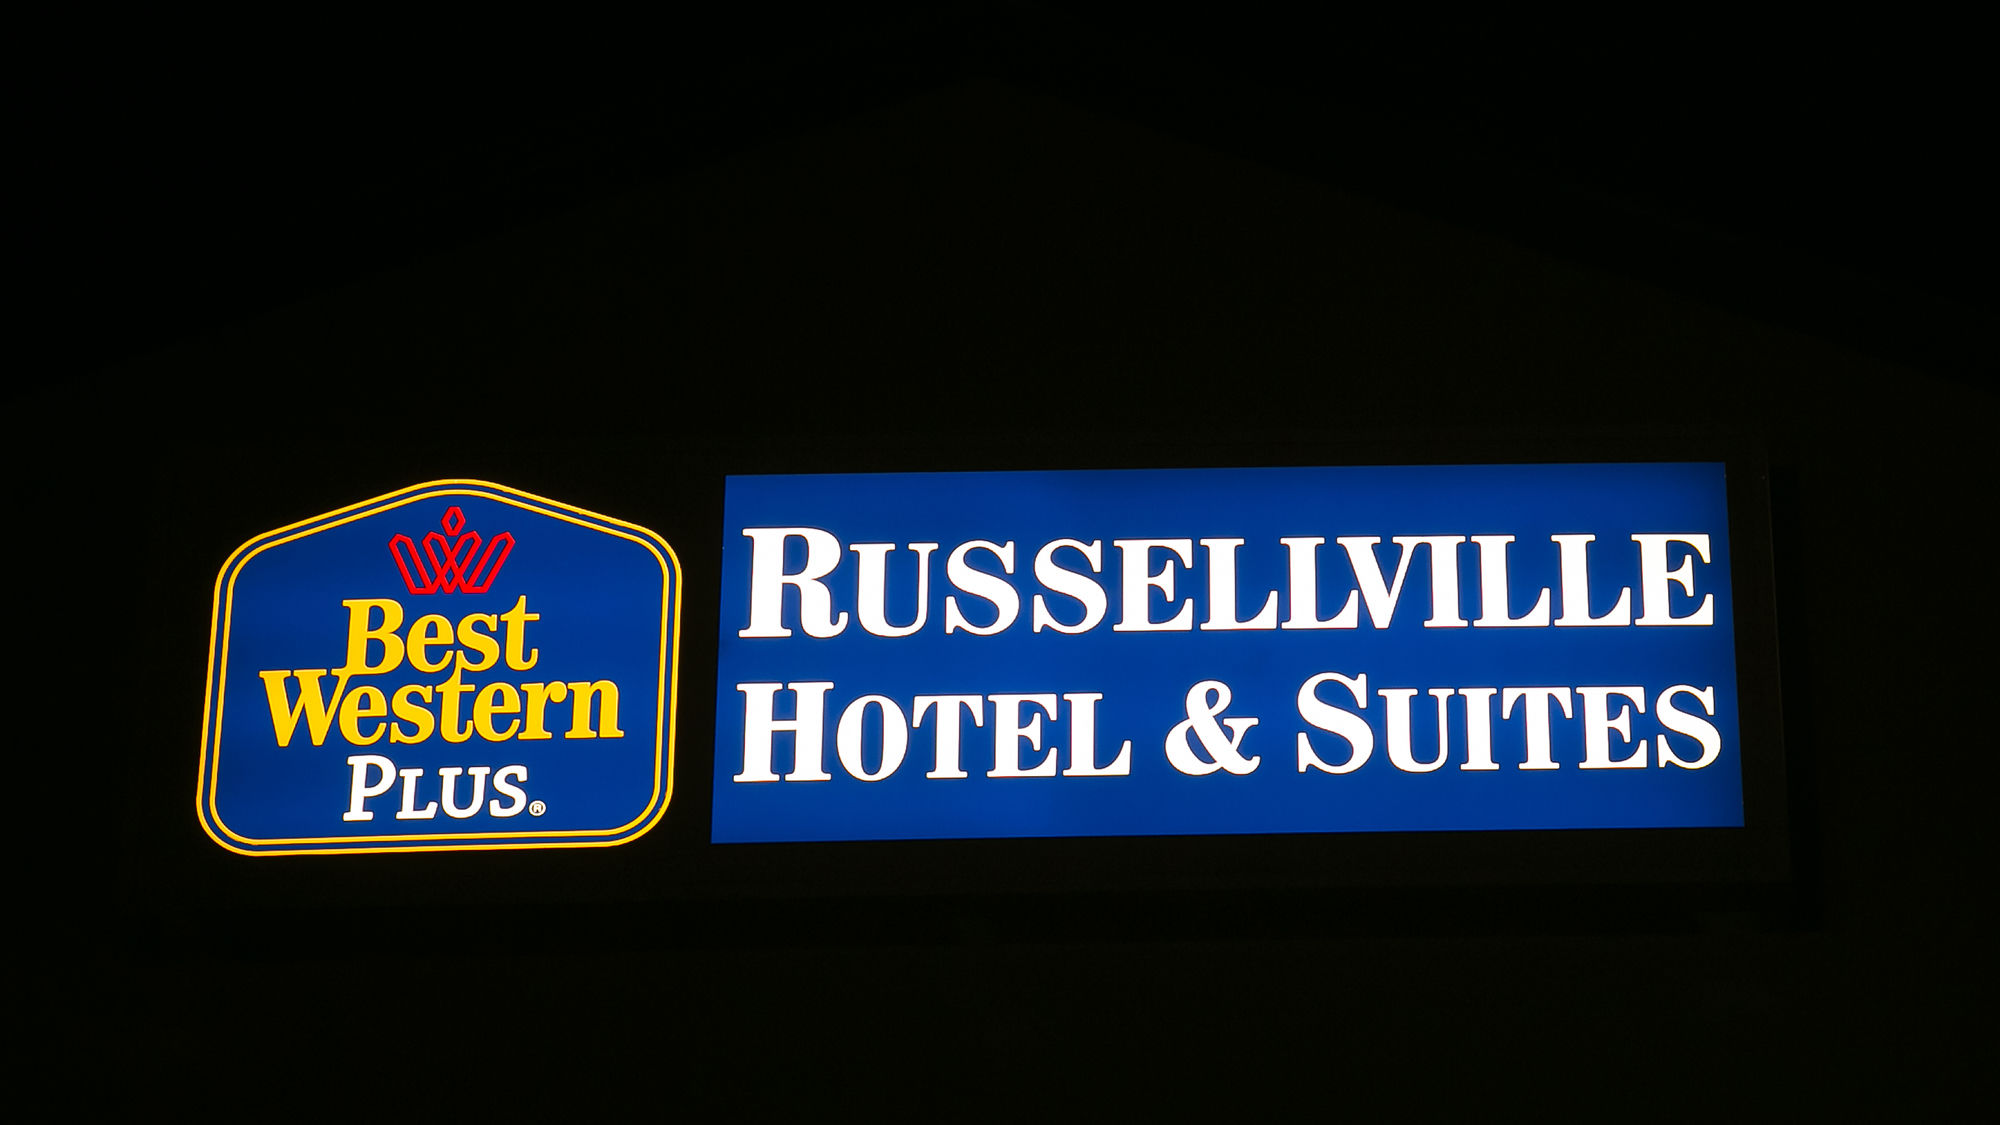 Best Western Plus Russellville Hotel & Suites in Russellville, AL